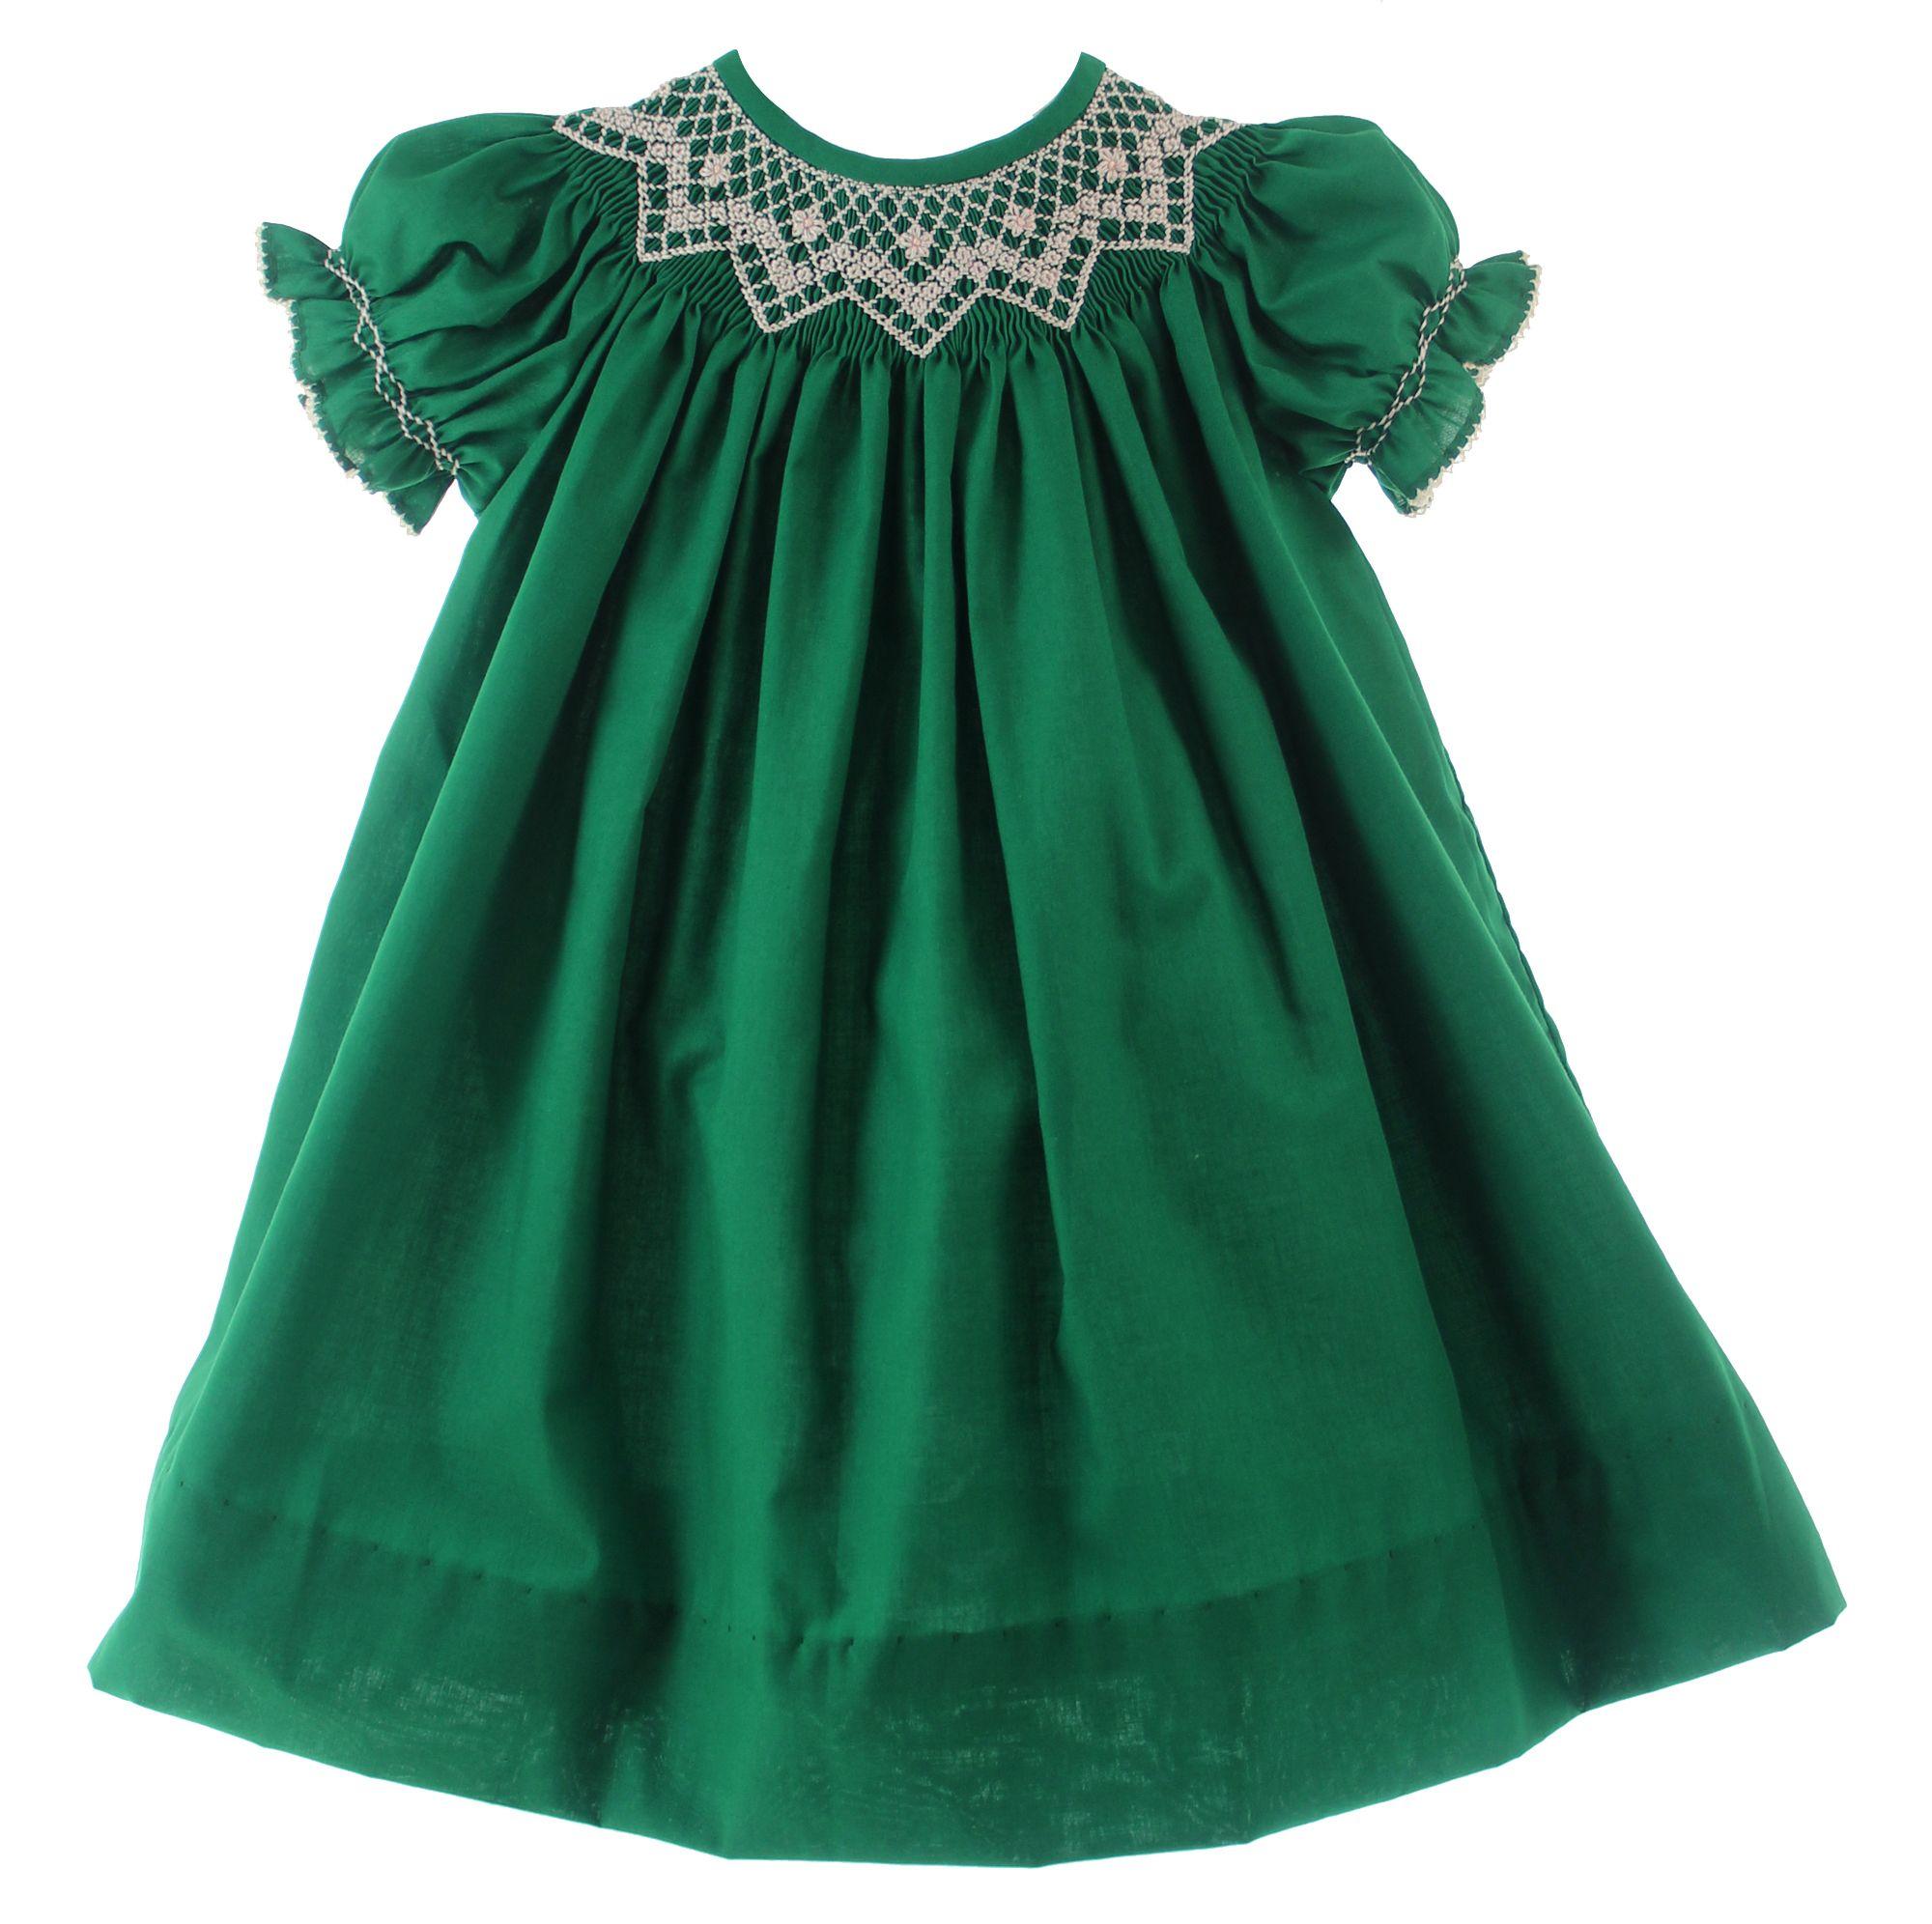 Girls Emerald Green Smocked Christmas Dress